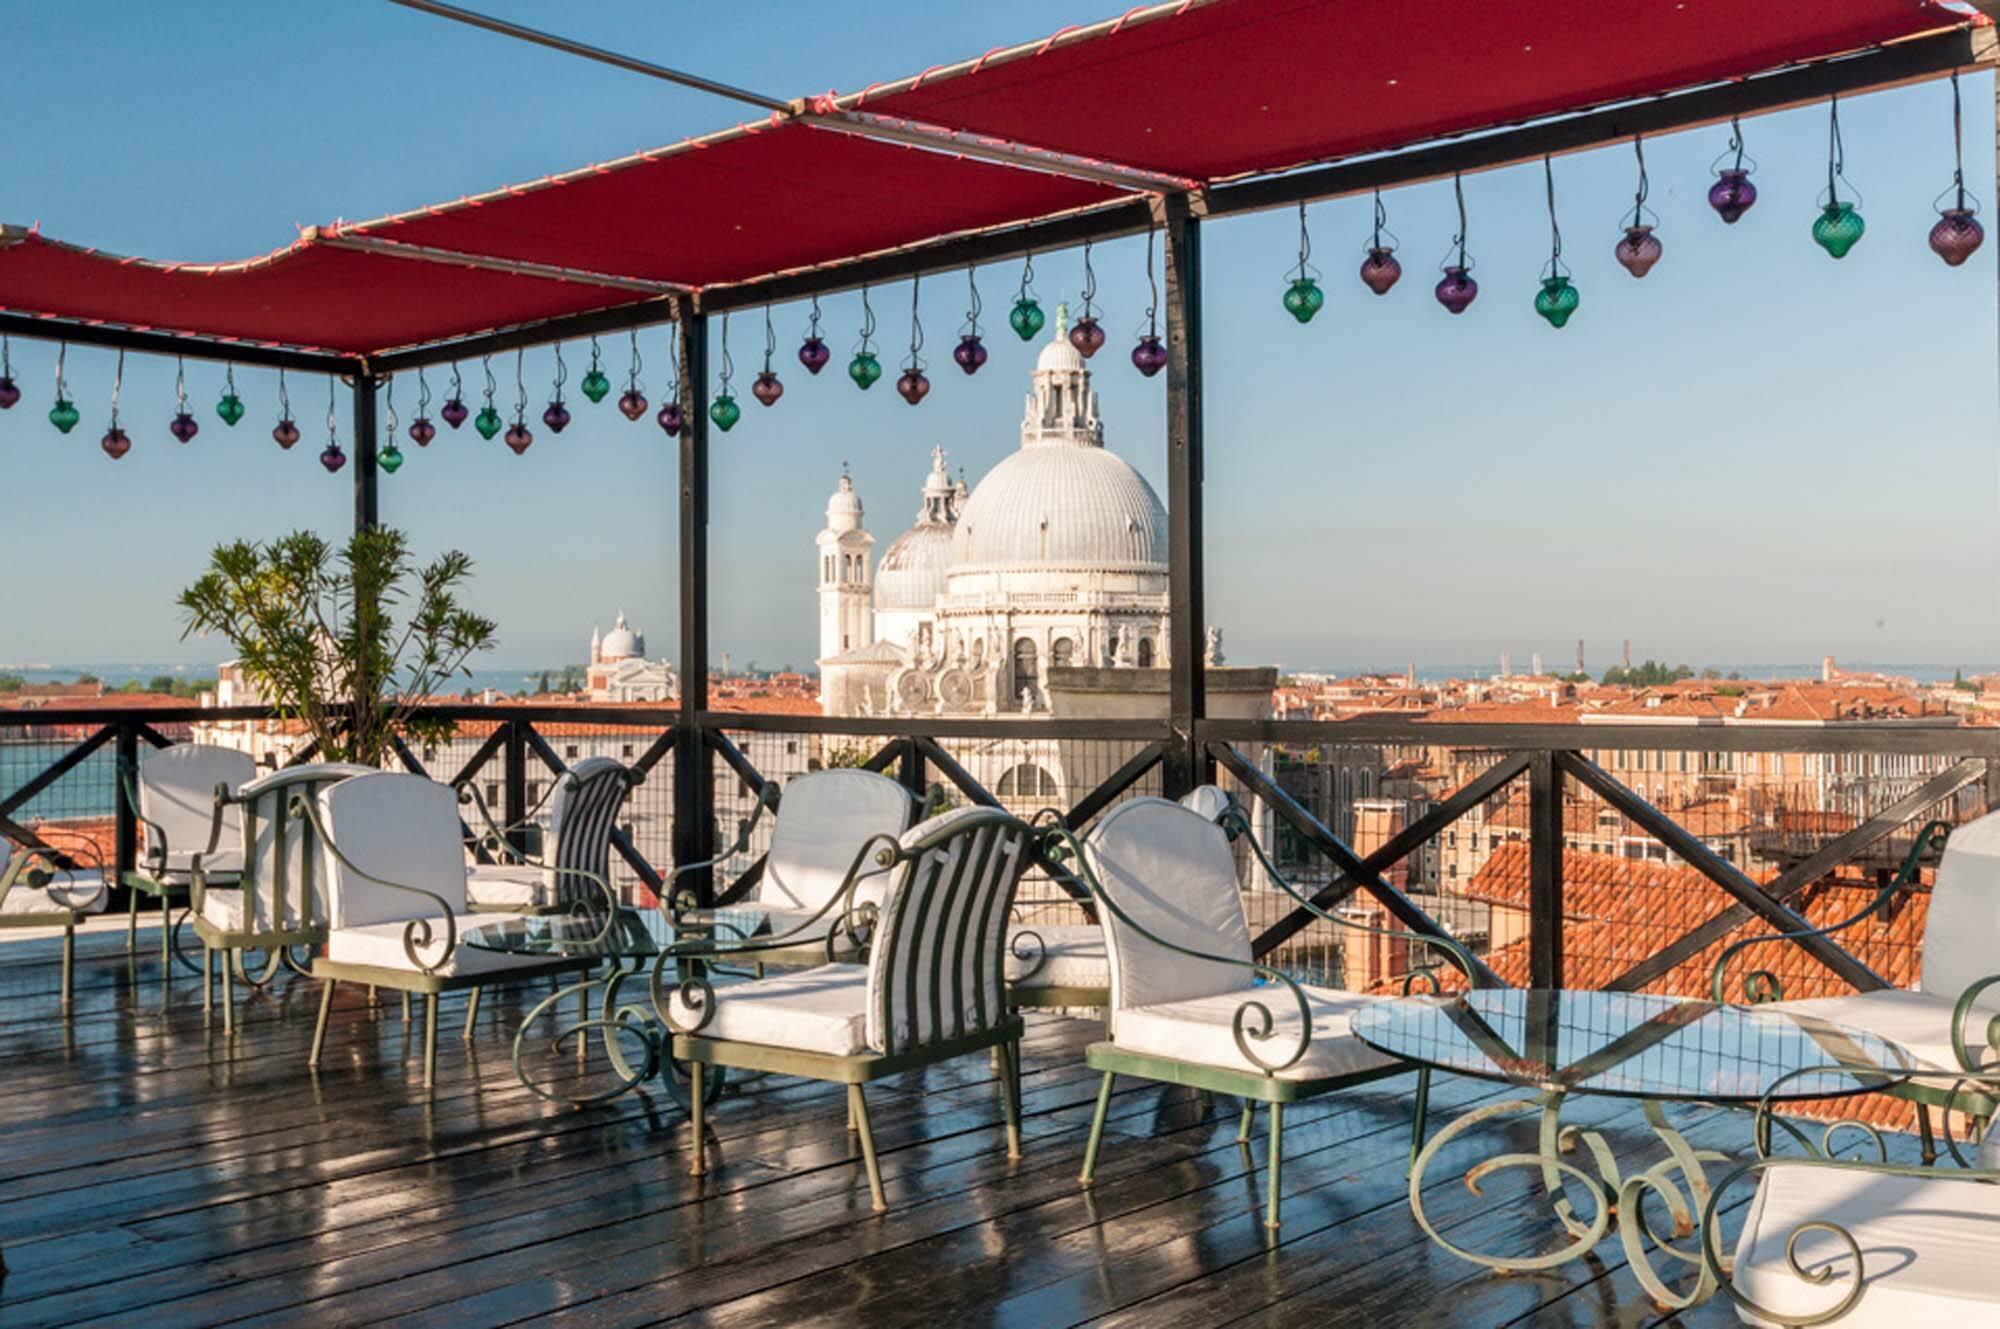 Bauer Venezia Venise Italie Settimo Cielo Terrace